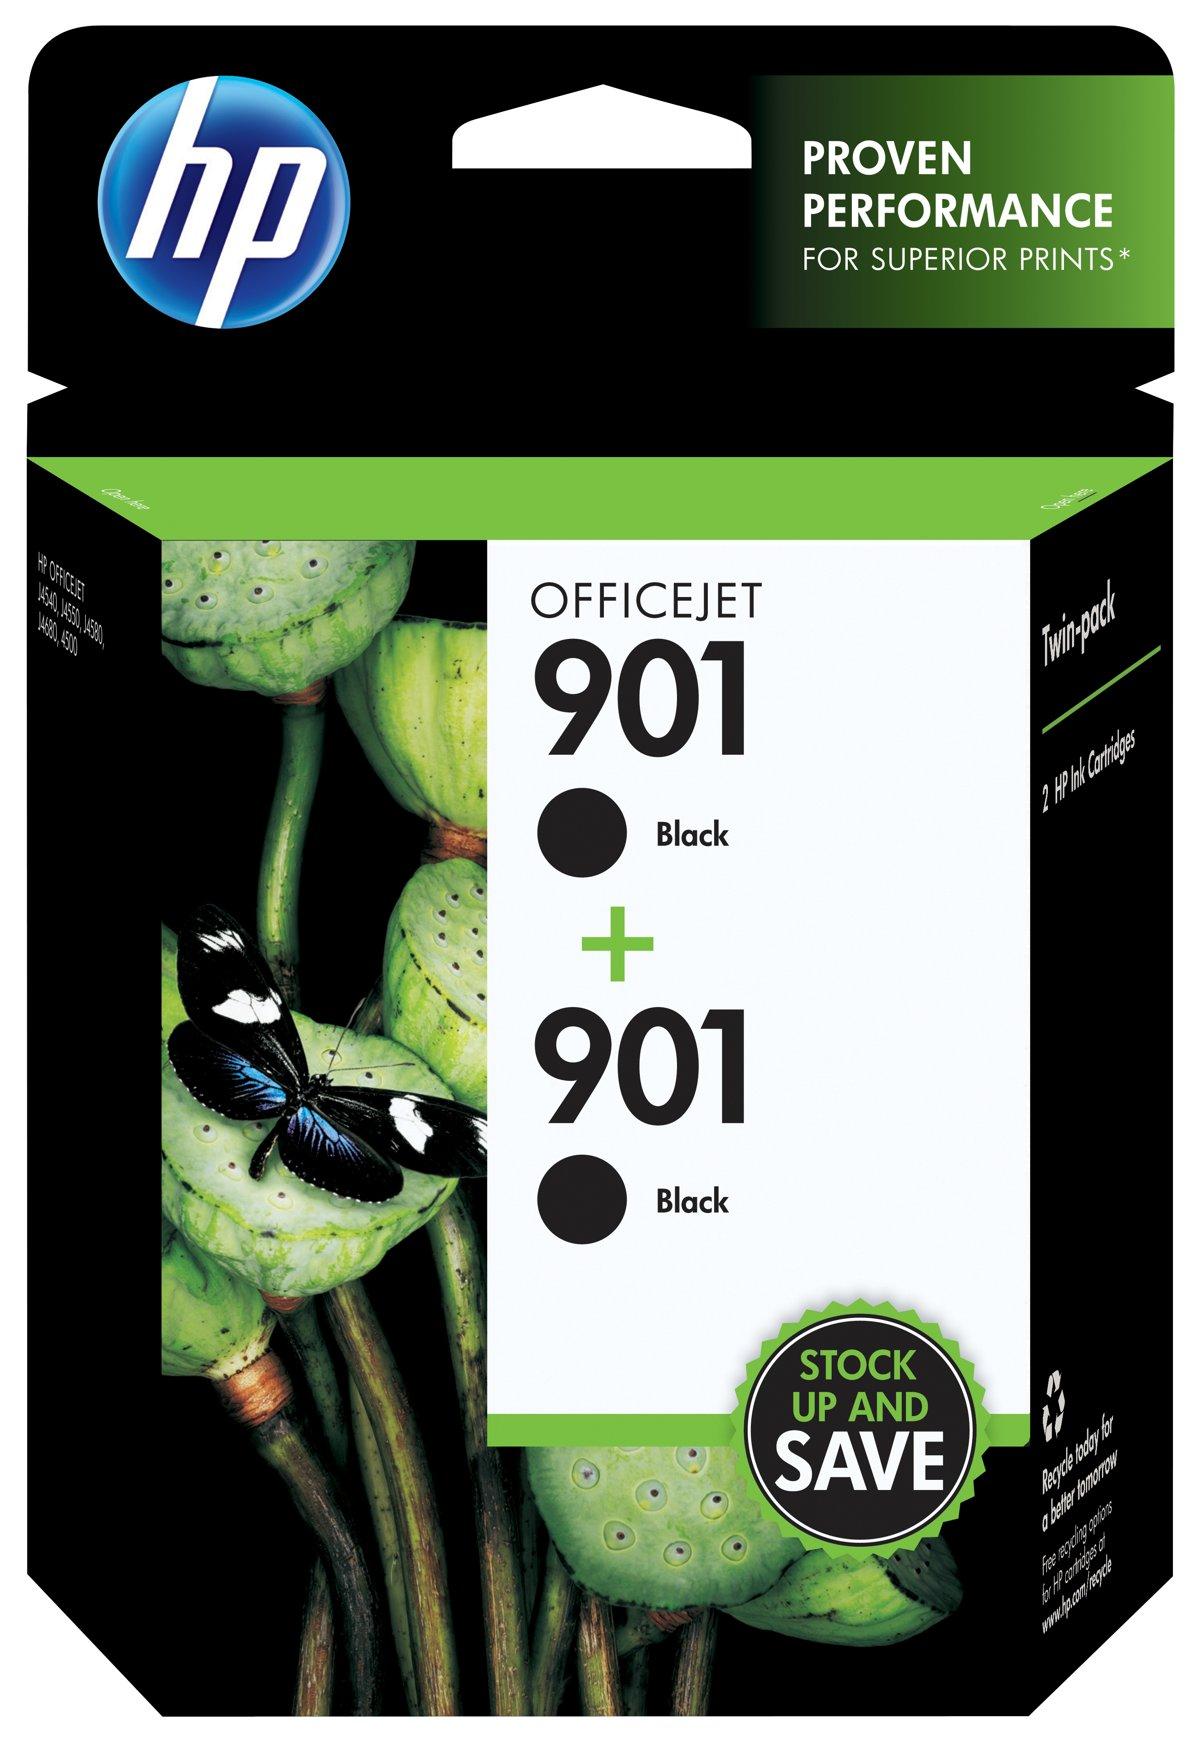 HP 901 Black Original Ink Cartridges CZ075FN Pack 2 by fice Depot & ficeMax